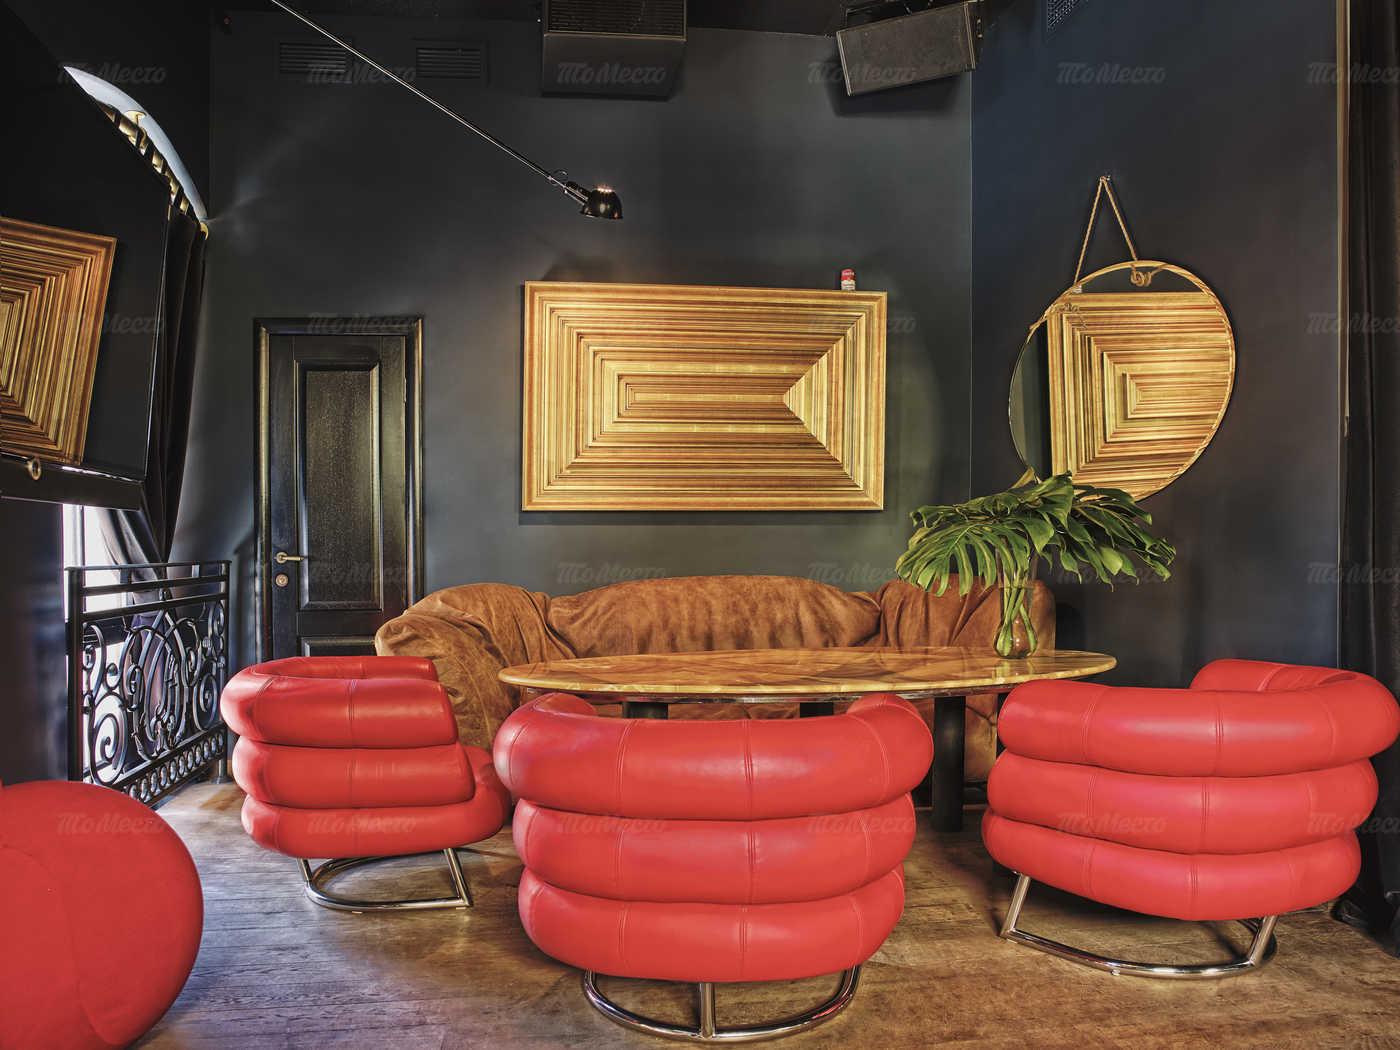 Меню бара, ресторана FF Bar на улице Тимура Фрунзе